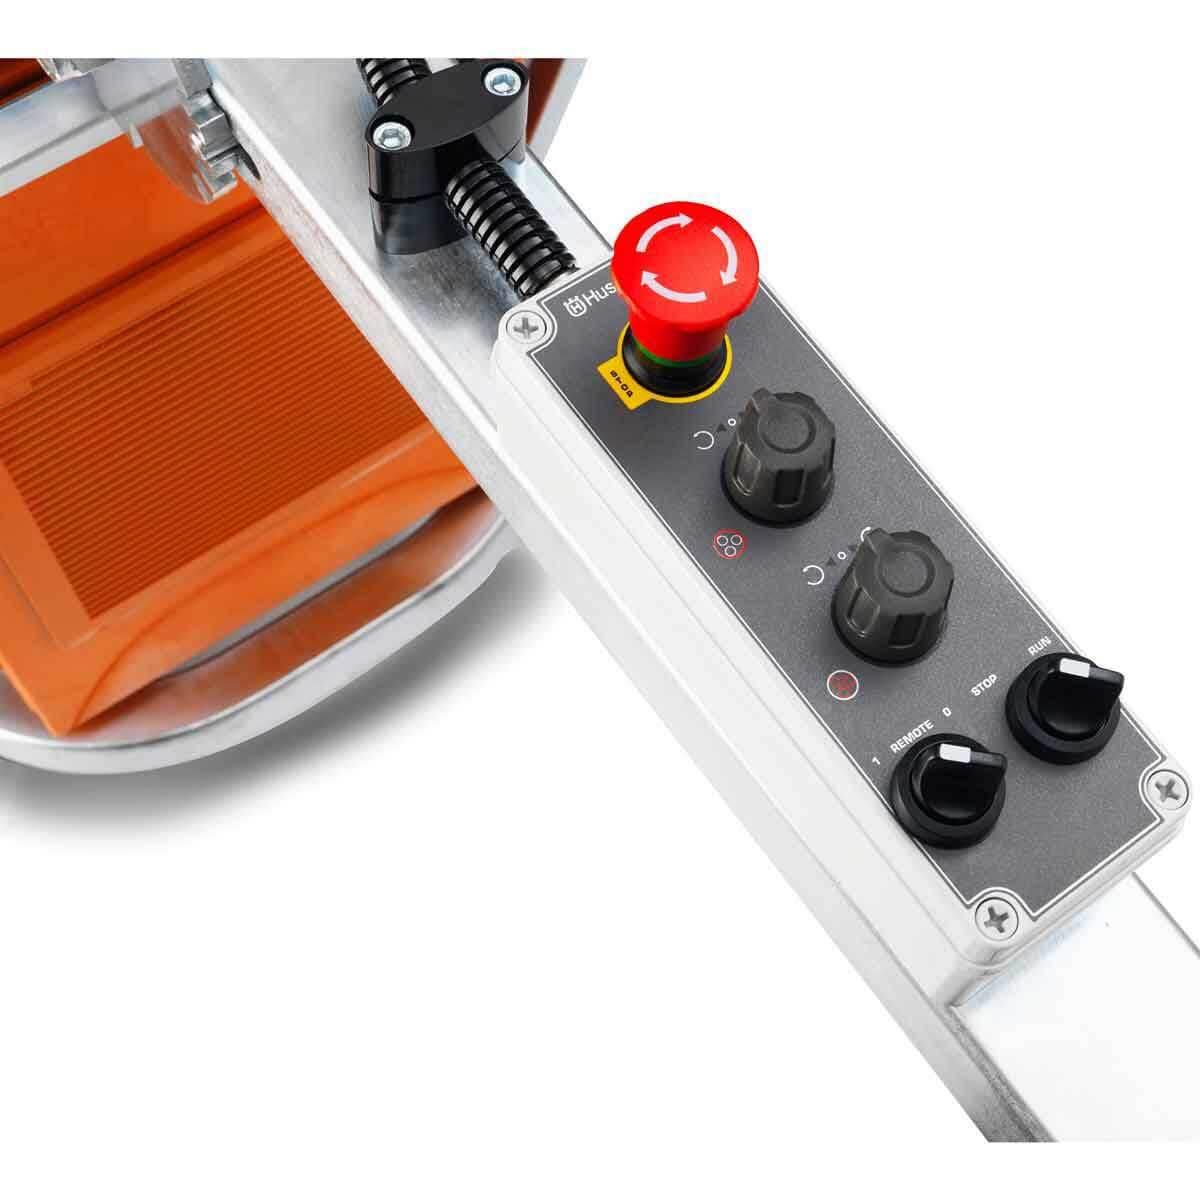 Husqvarna PG820 RC remote control